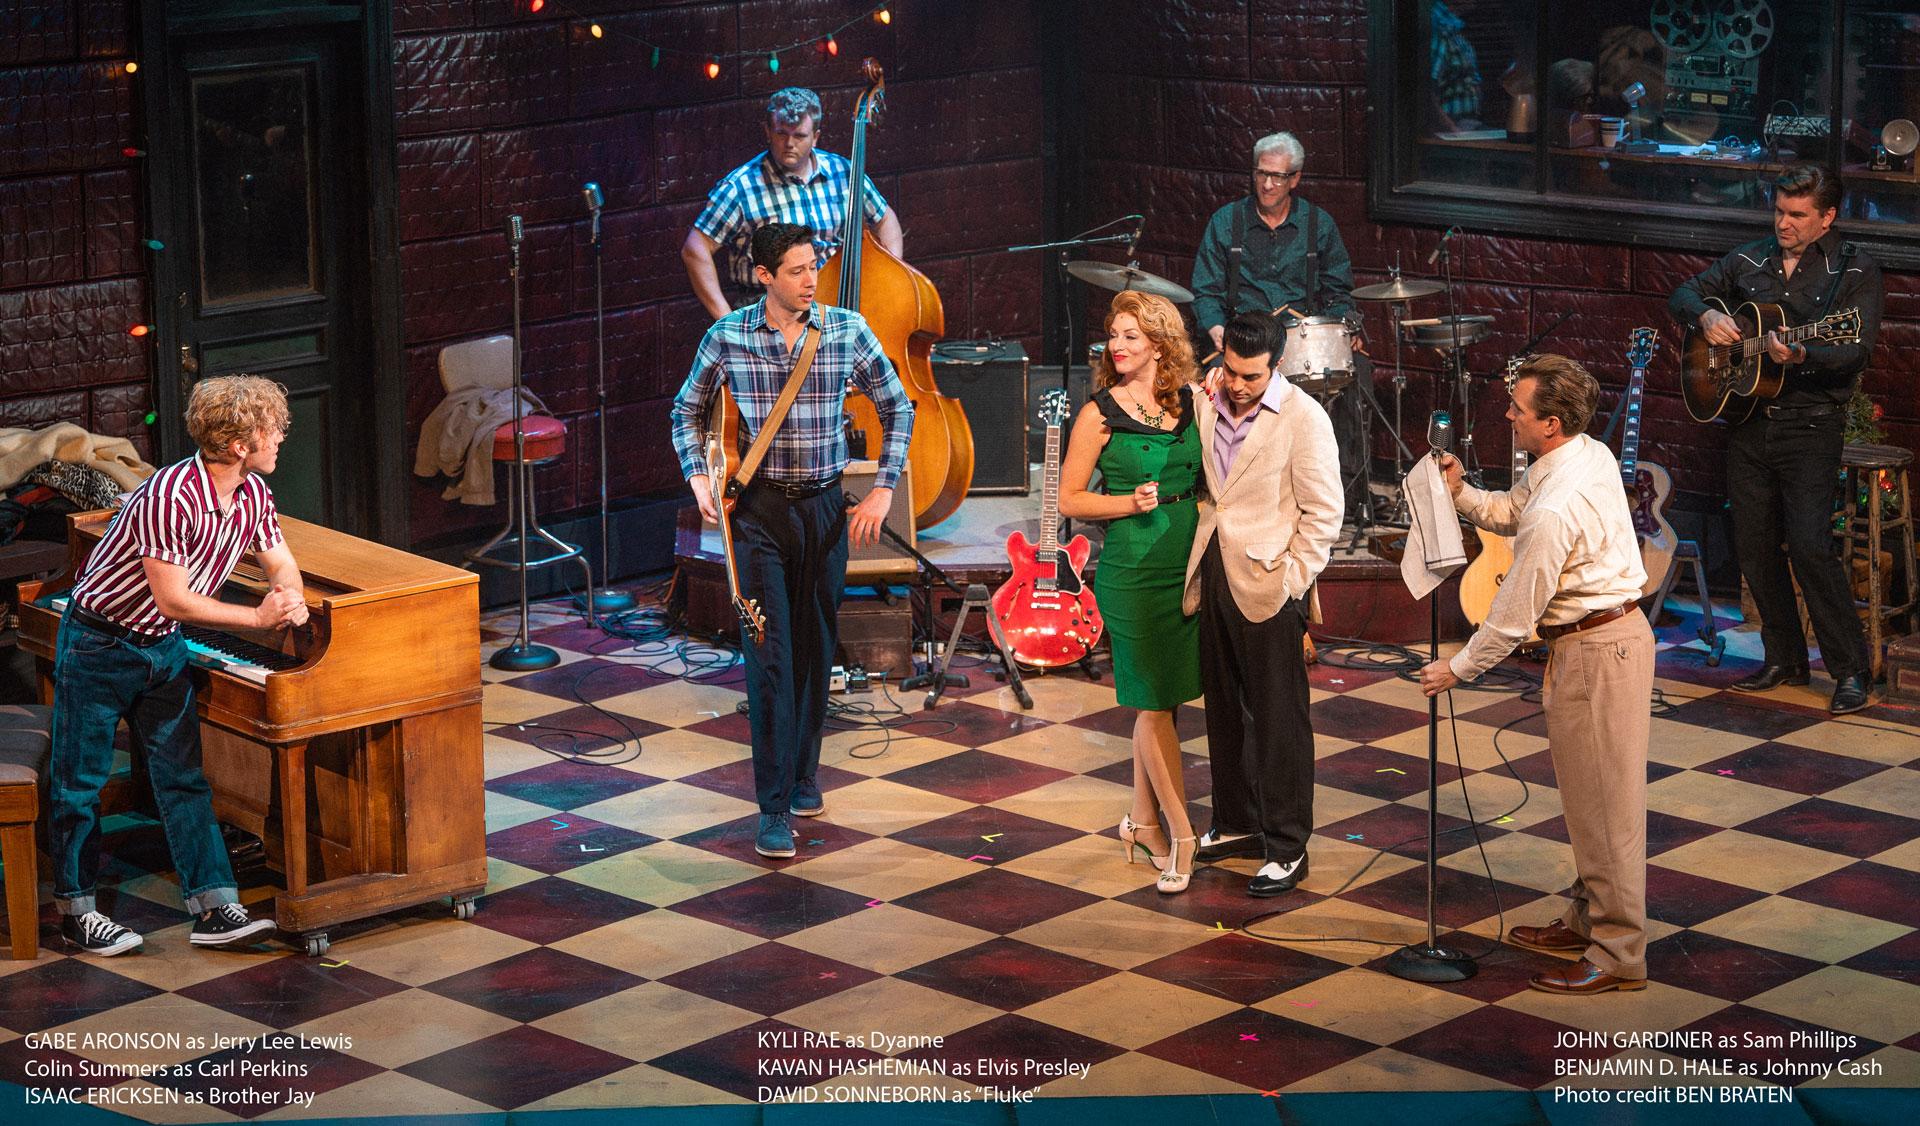 The cast of Million Dollar Quartet on stage